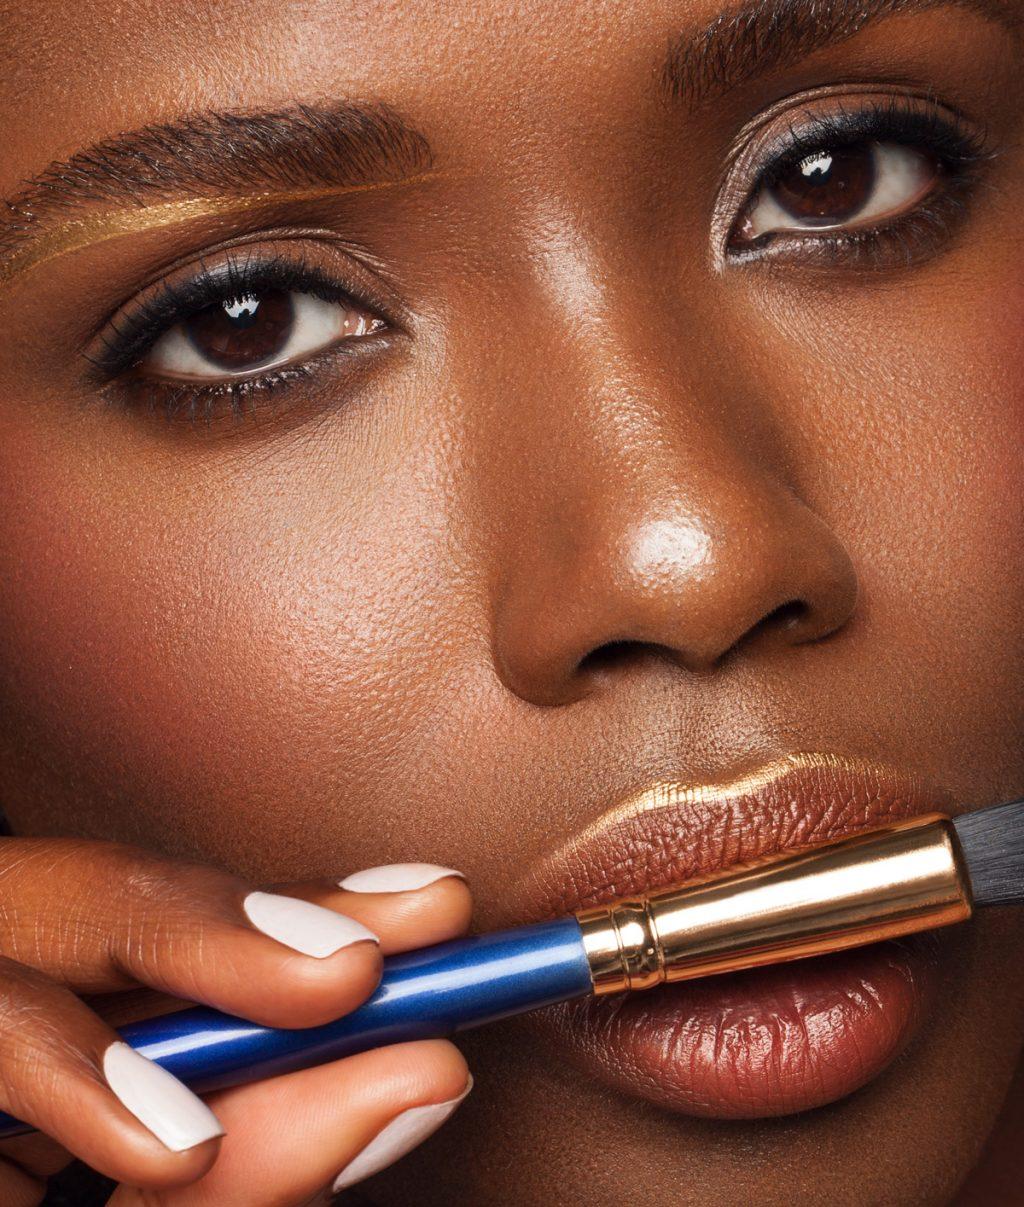 @porschethomas of @ntamodels ✨ makeup by the wonderful @vladamua photo & post @juliakuzmenko